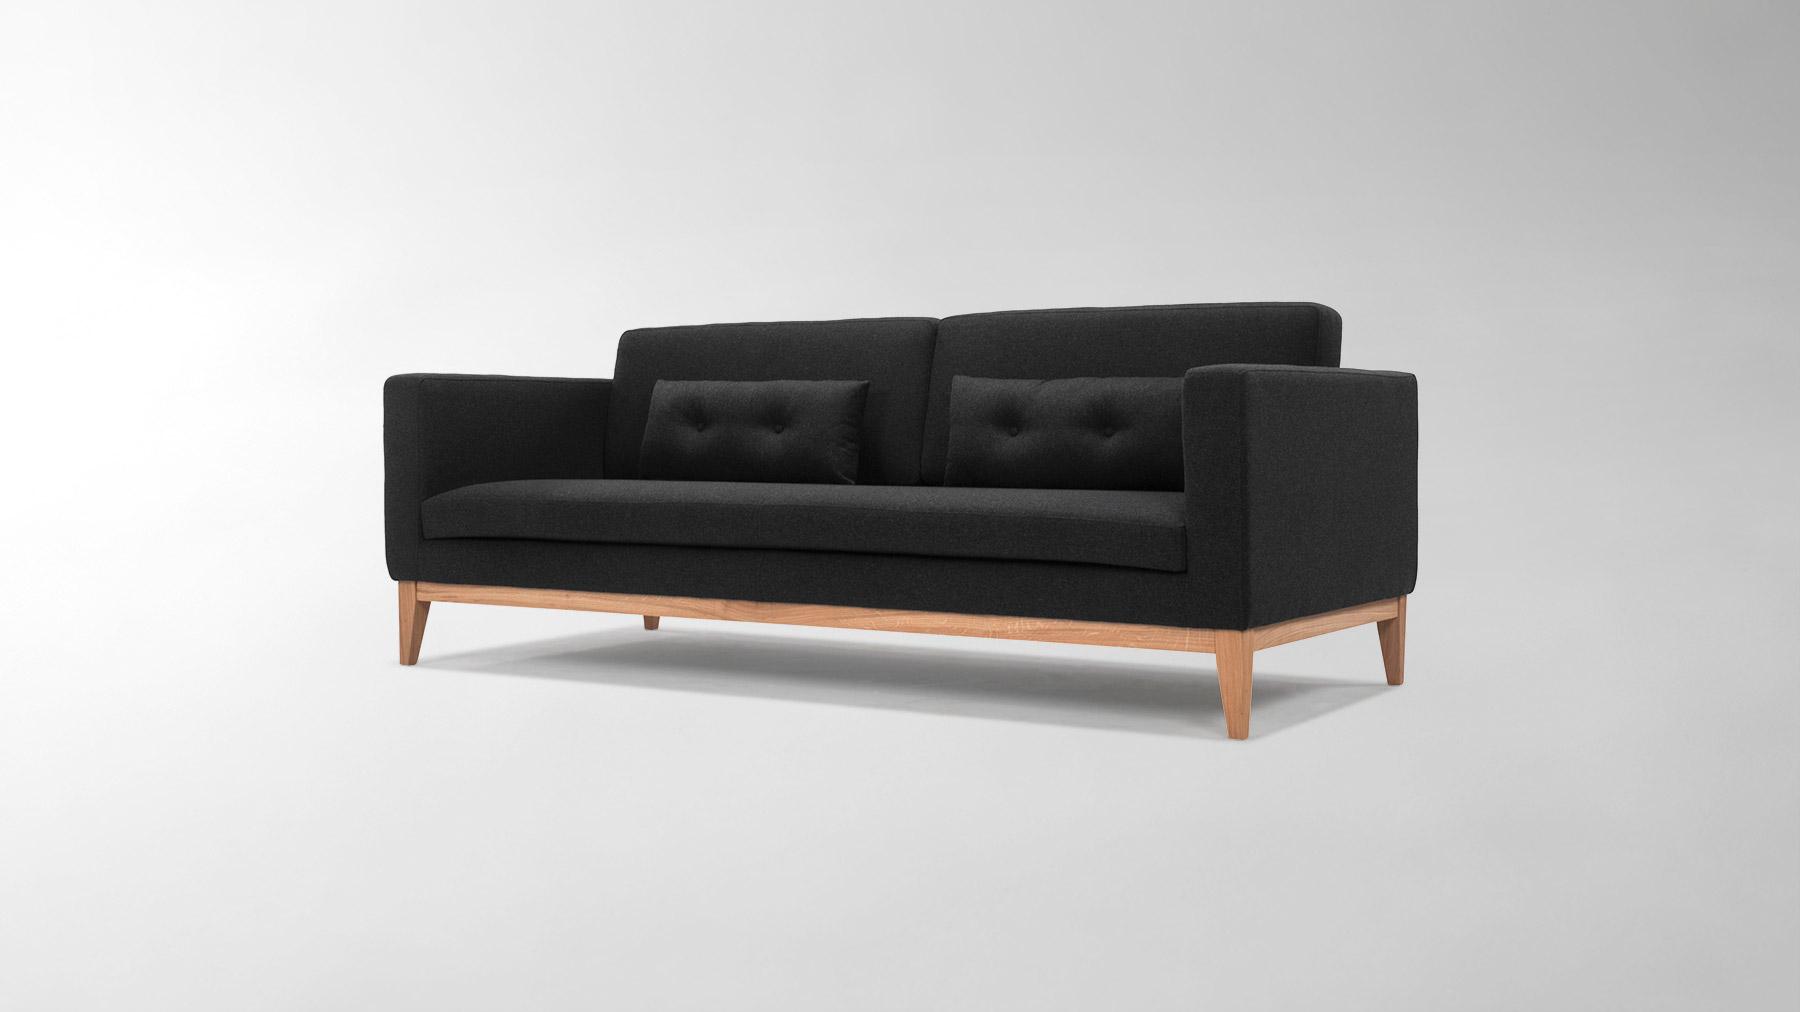 design sofa day sofa MWECQYZ